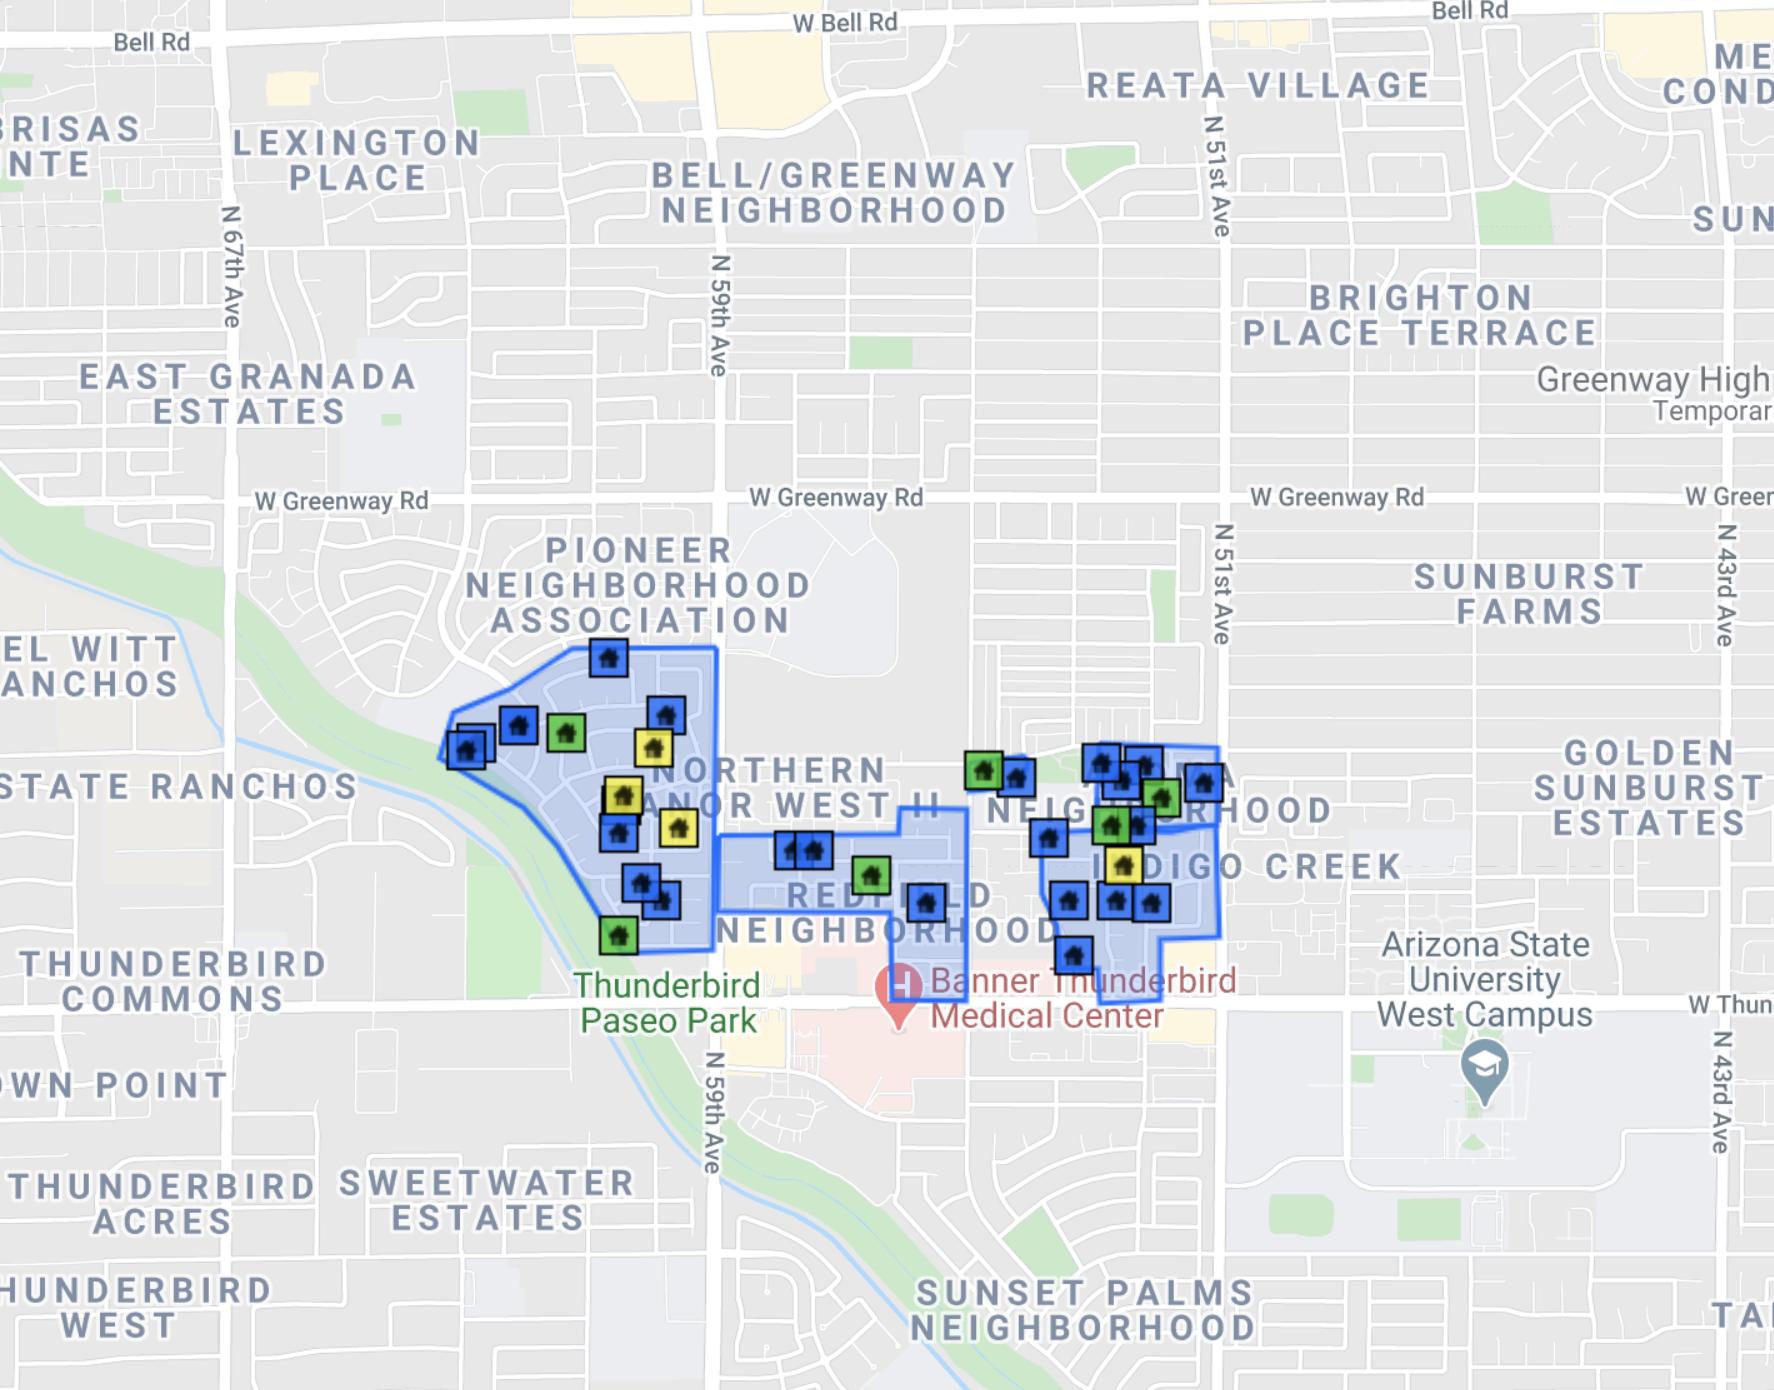 5827 W Hearn Rd Glendale, AZ 85306  comps map